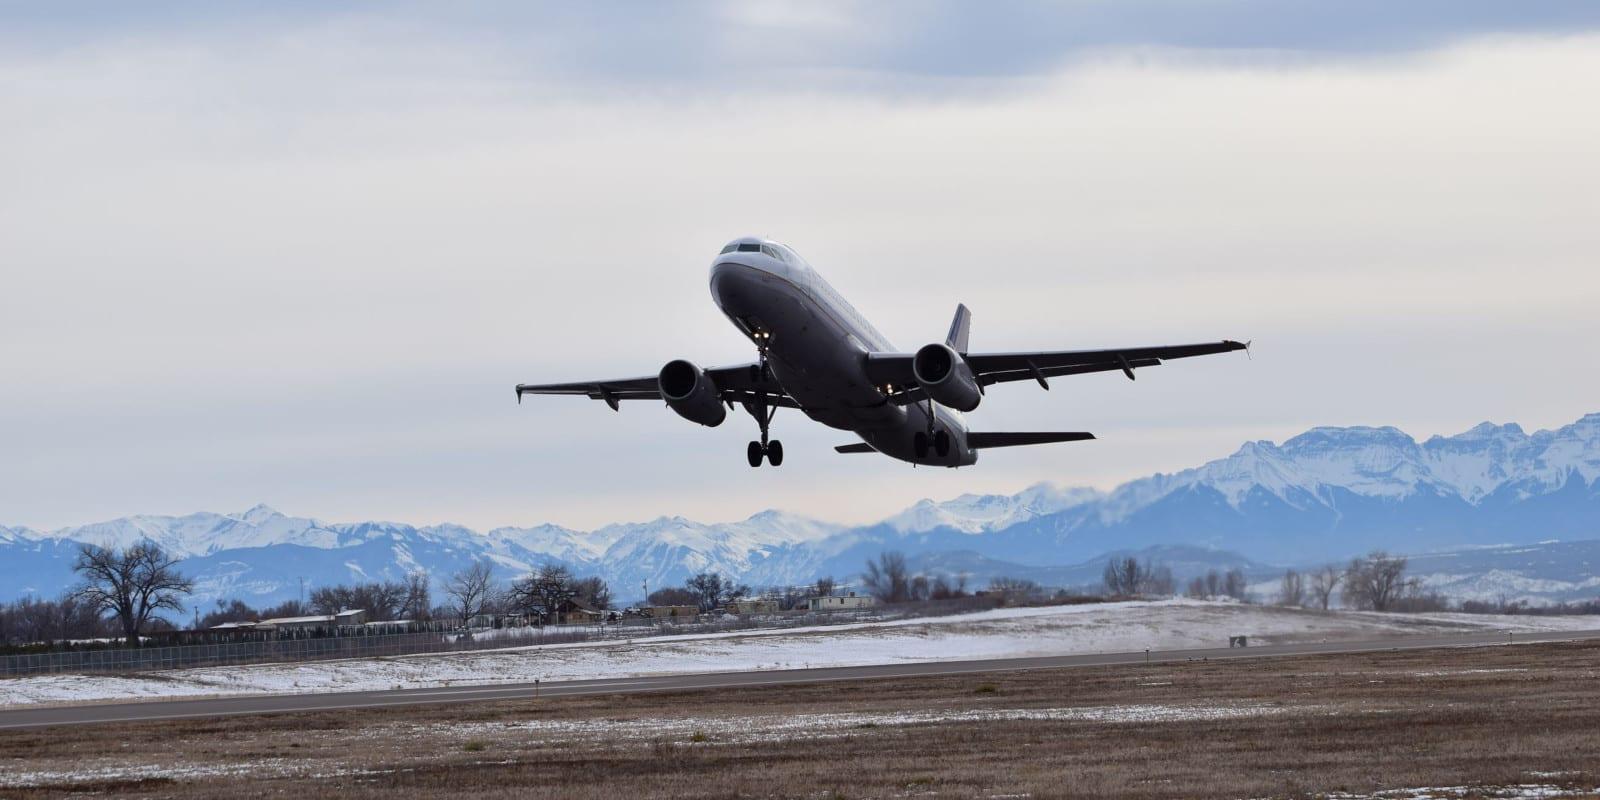 Montrose Regional Airport Departure Plane Takeoff